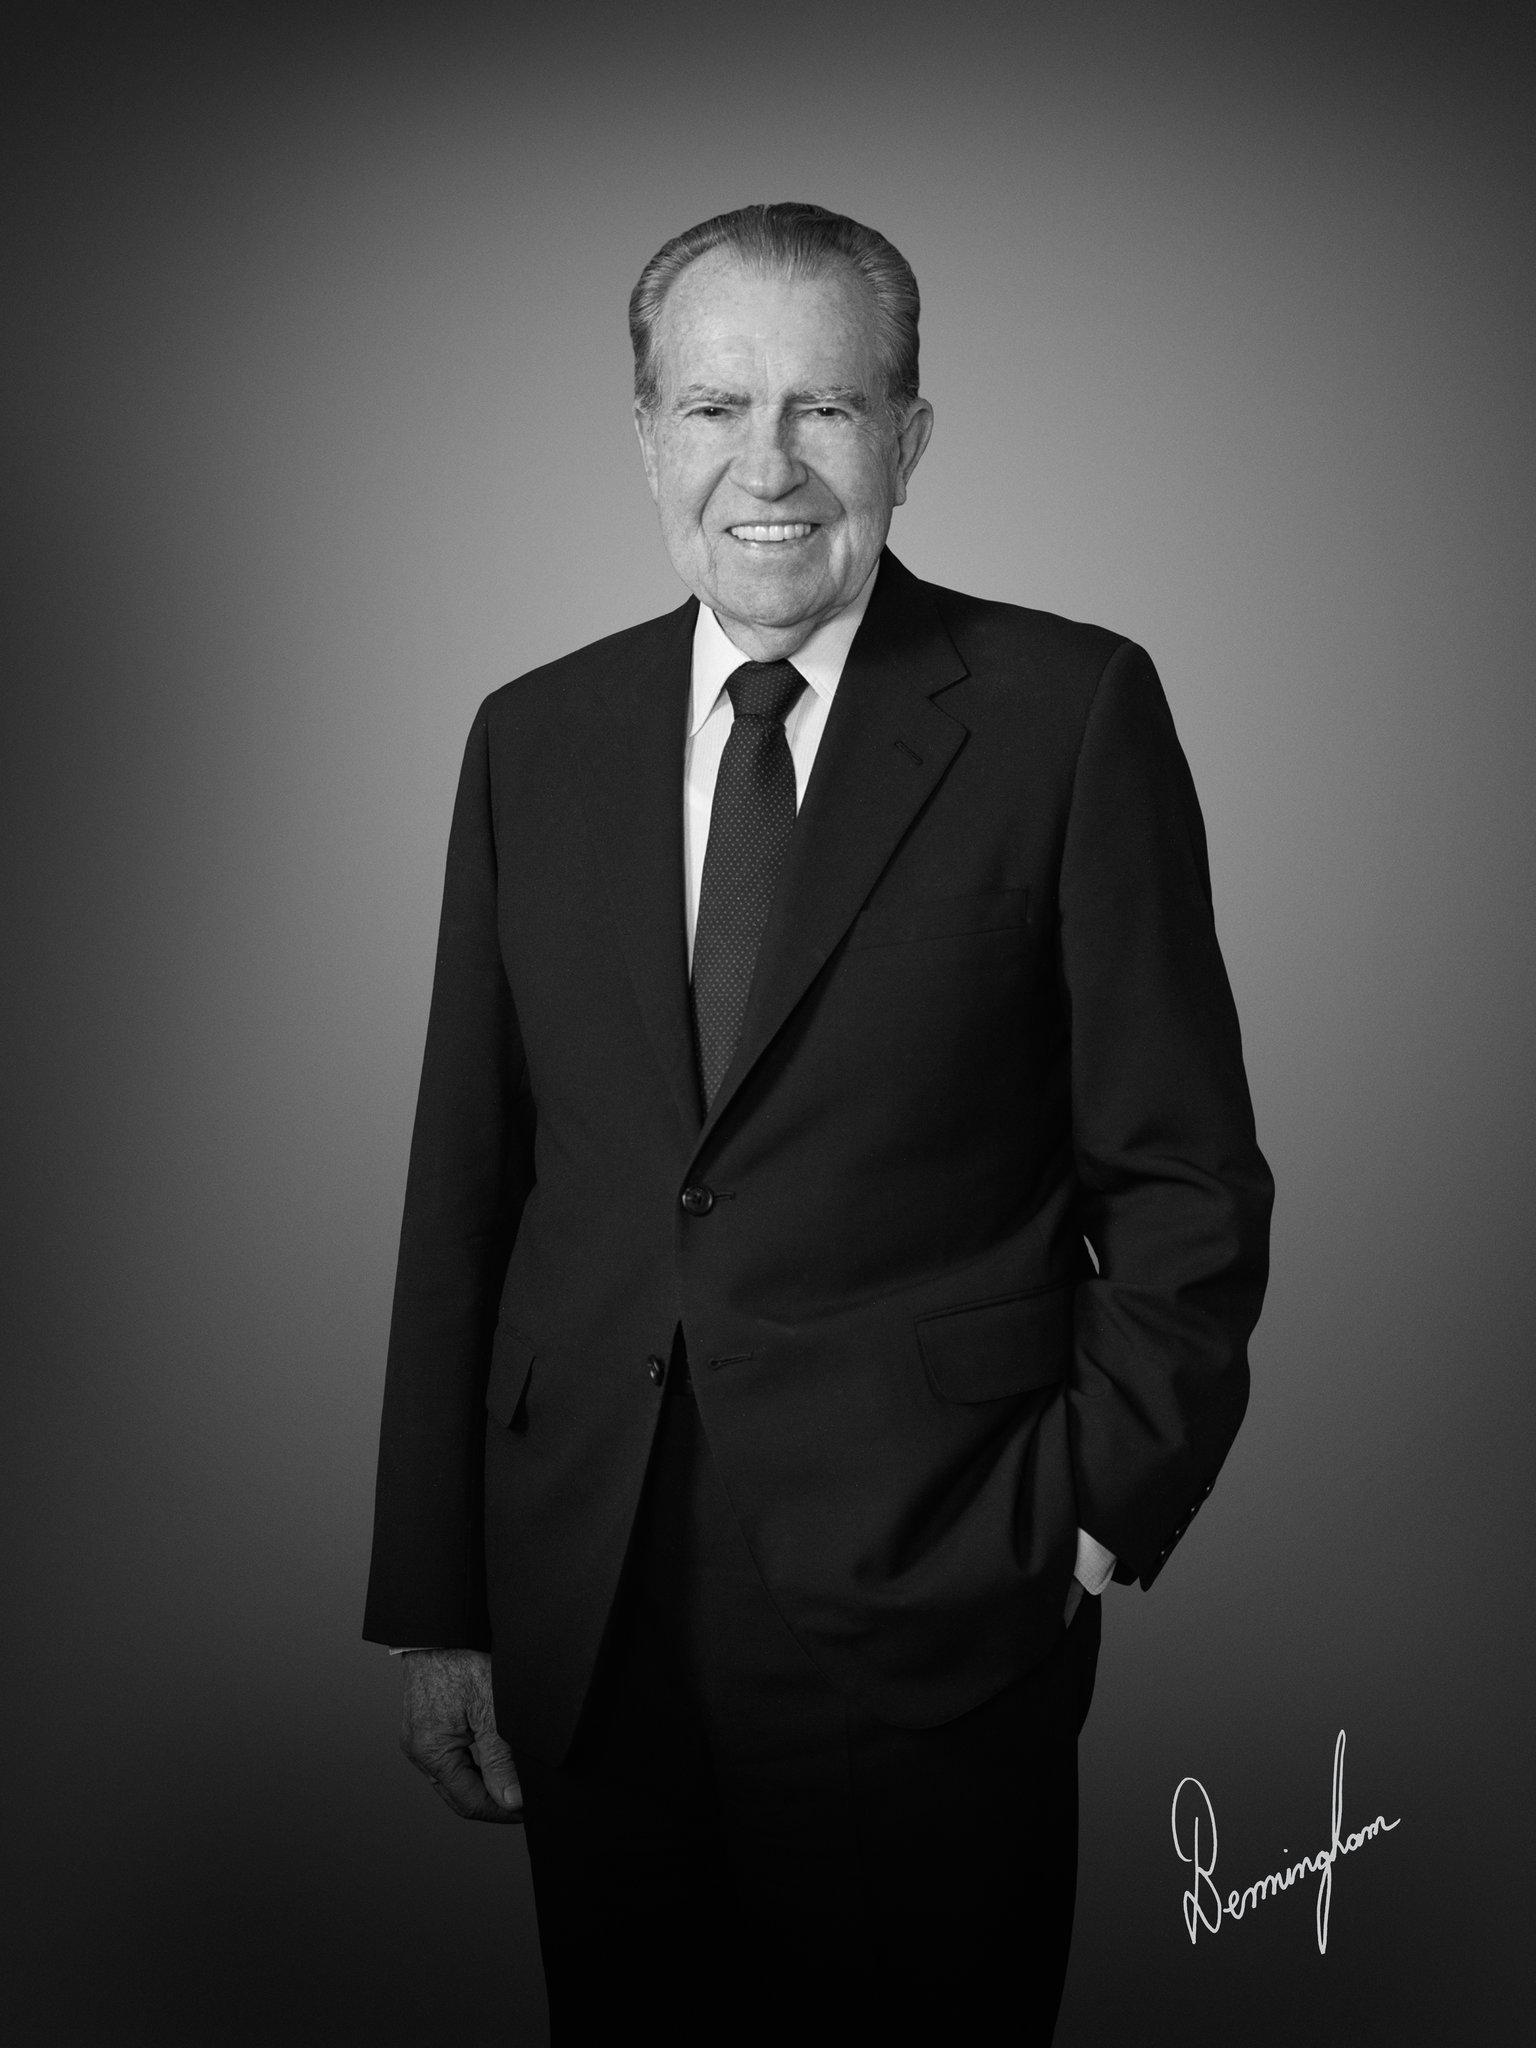 0012_Nixon standing.jpg